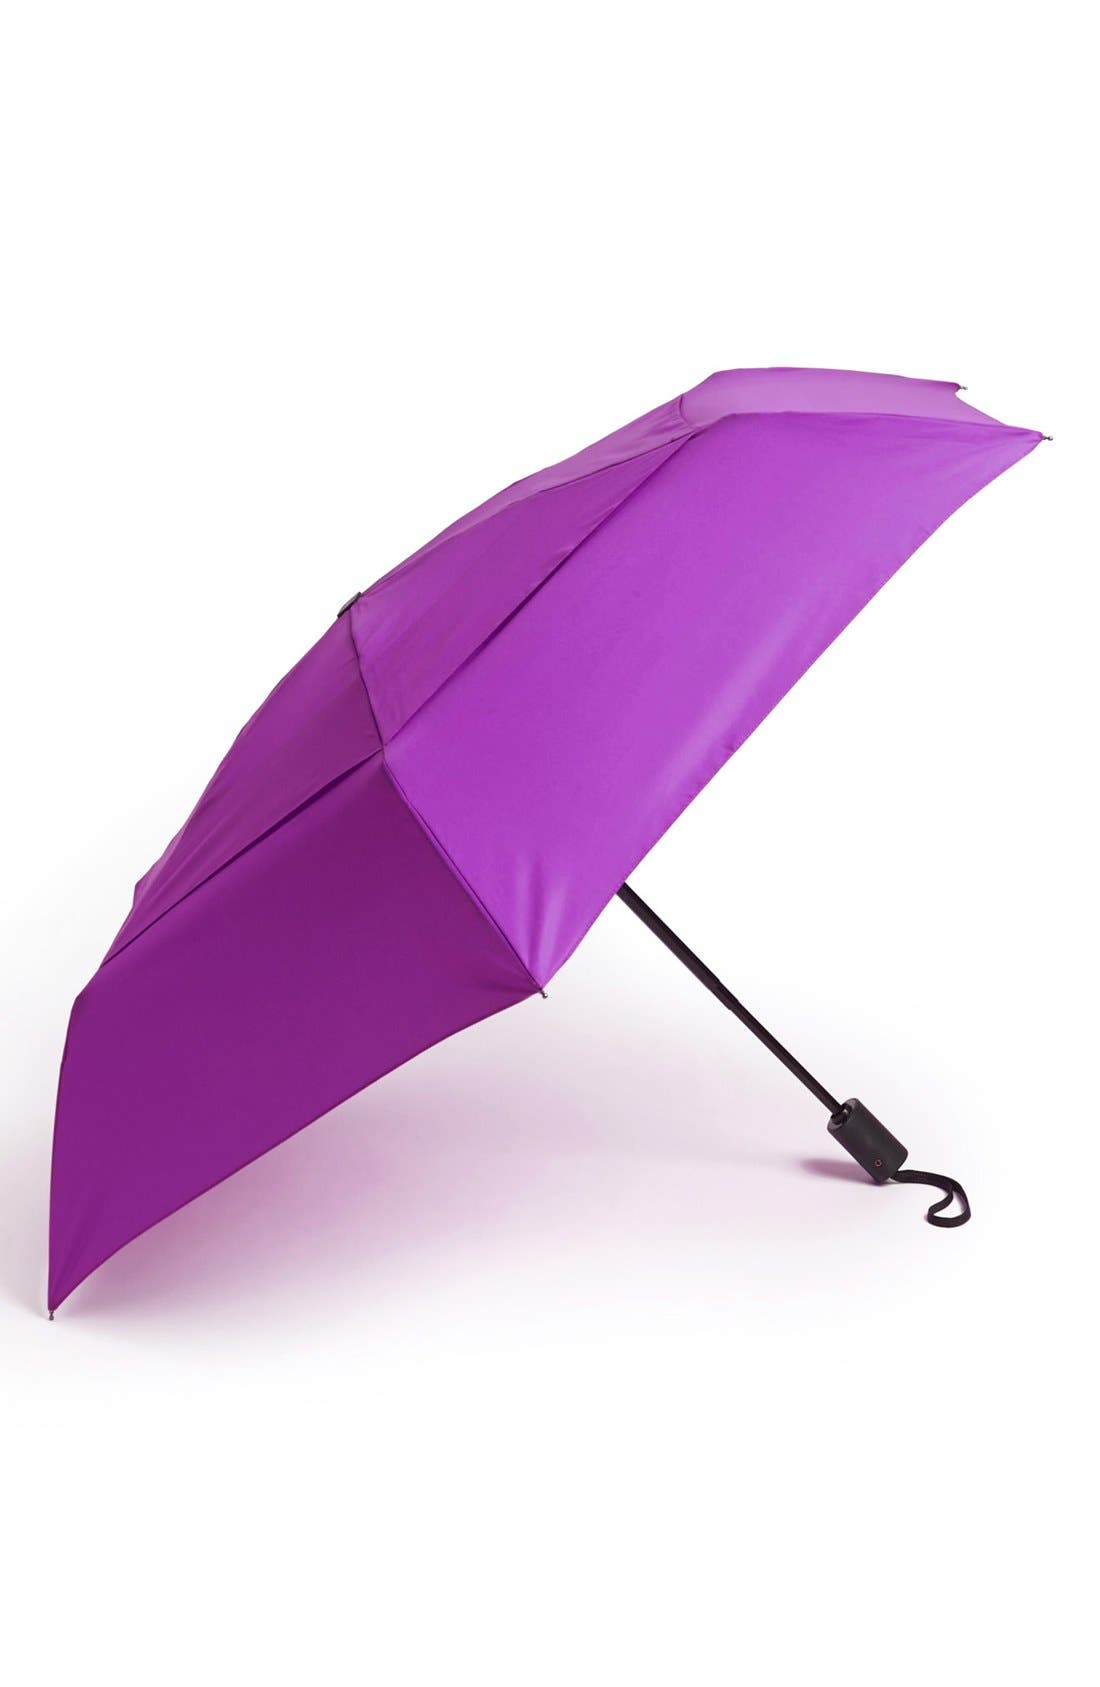 'WindPro<sup>®</sup>' Auto Open & Close Umbrella,                         Main,                         color, HYACINTH